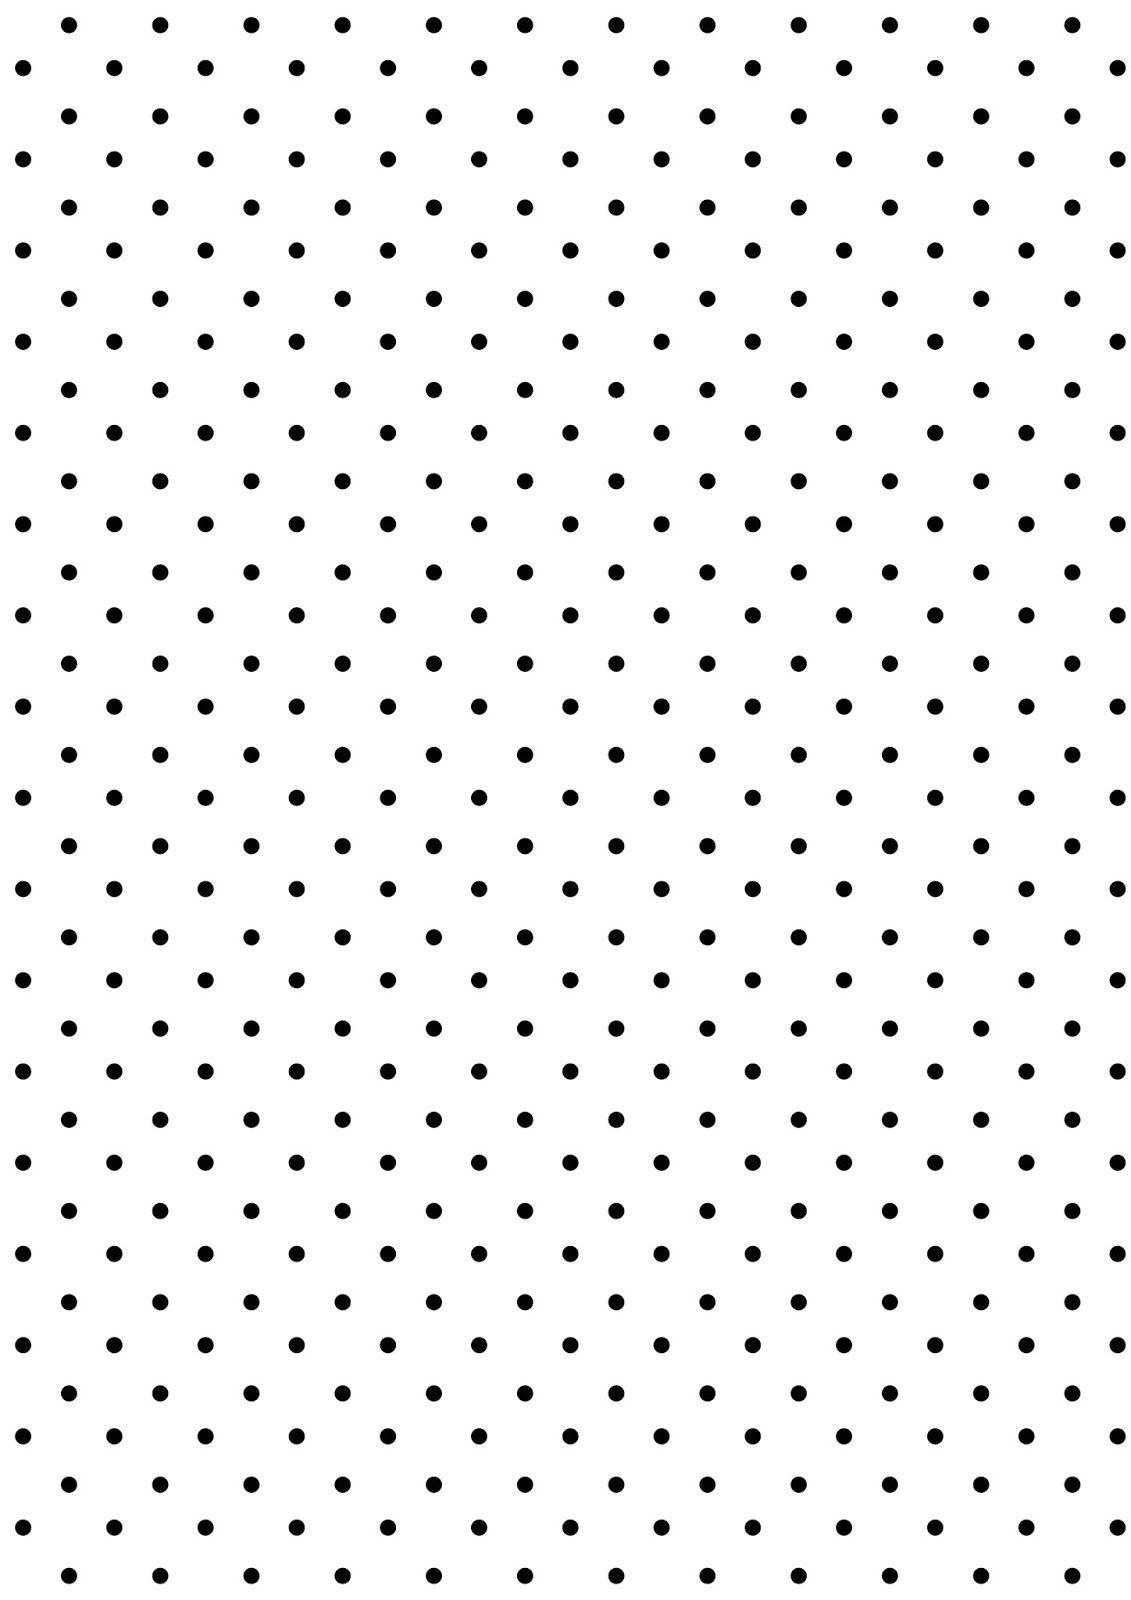 Dot clipart little black. Free dots download clip